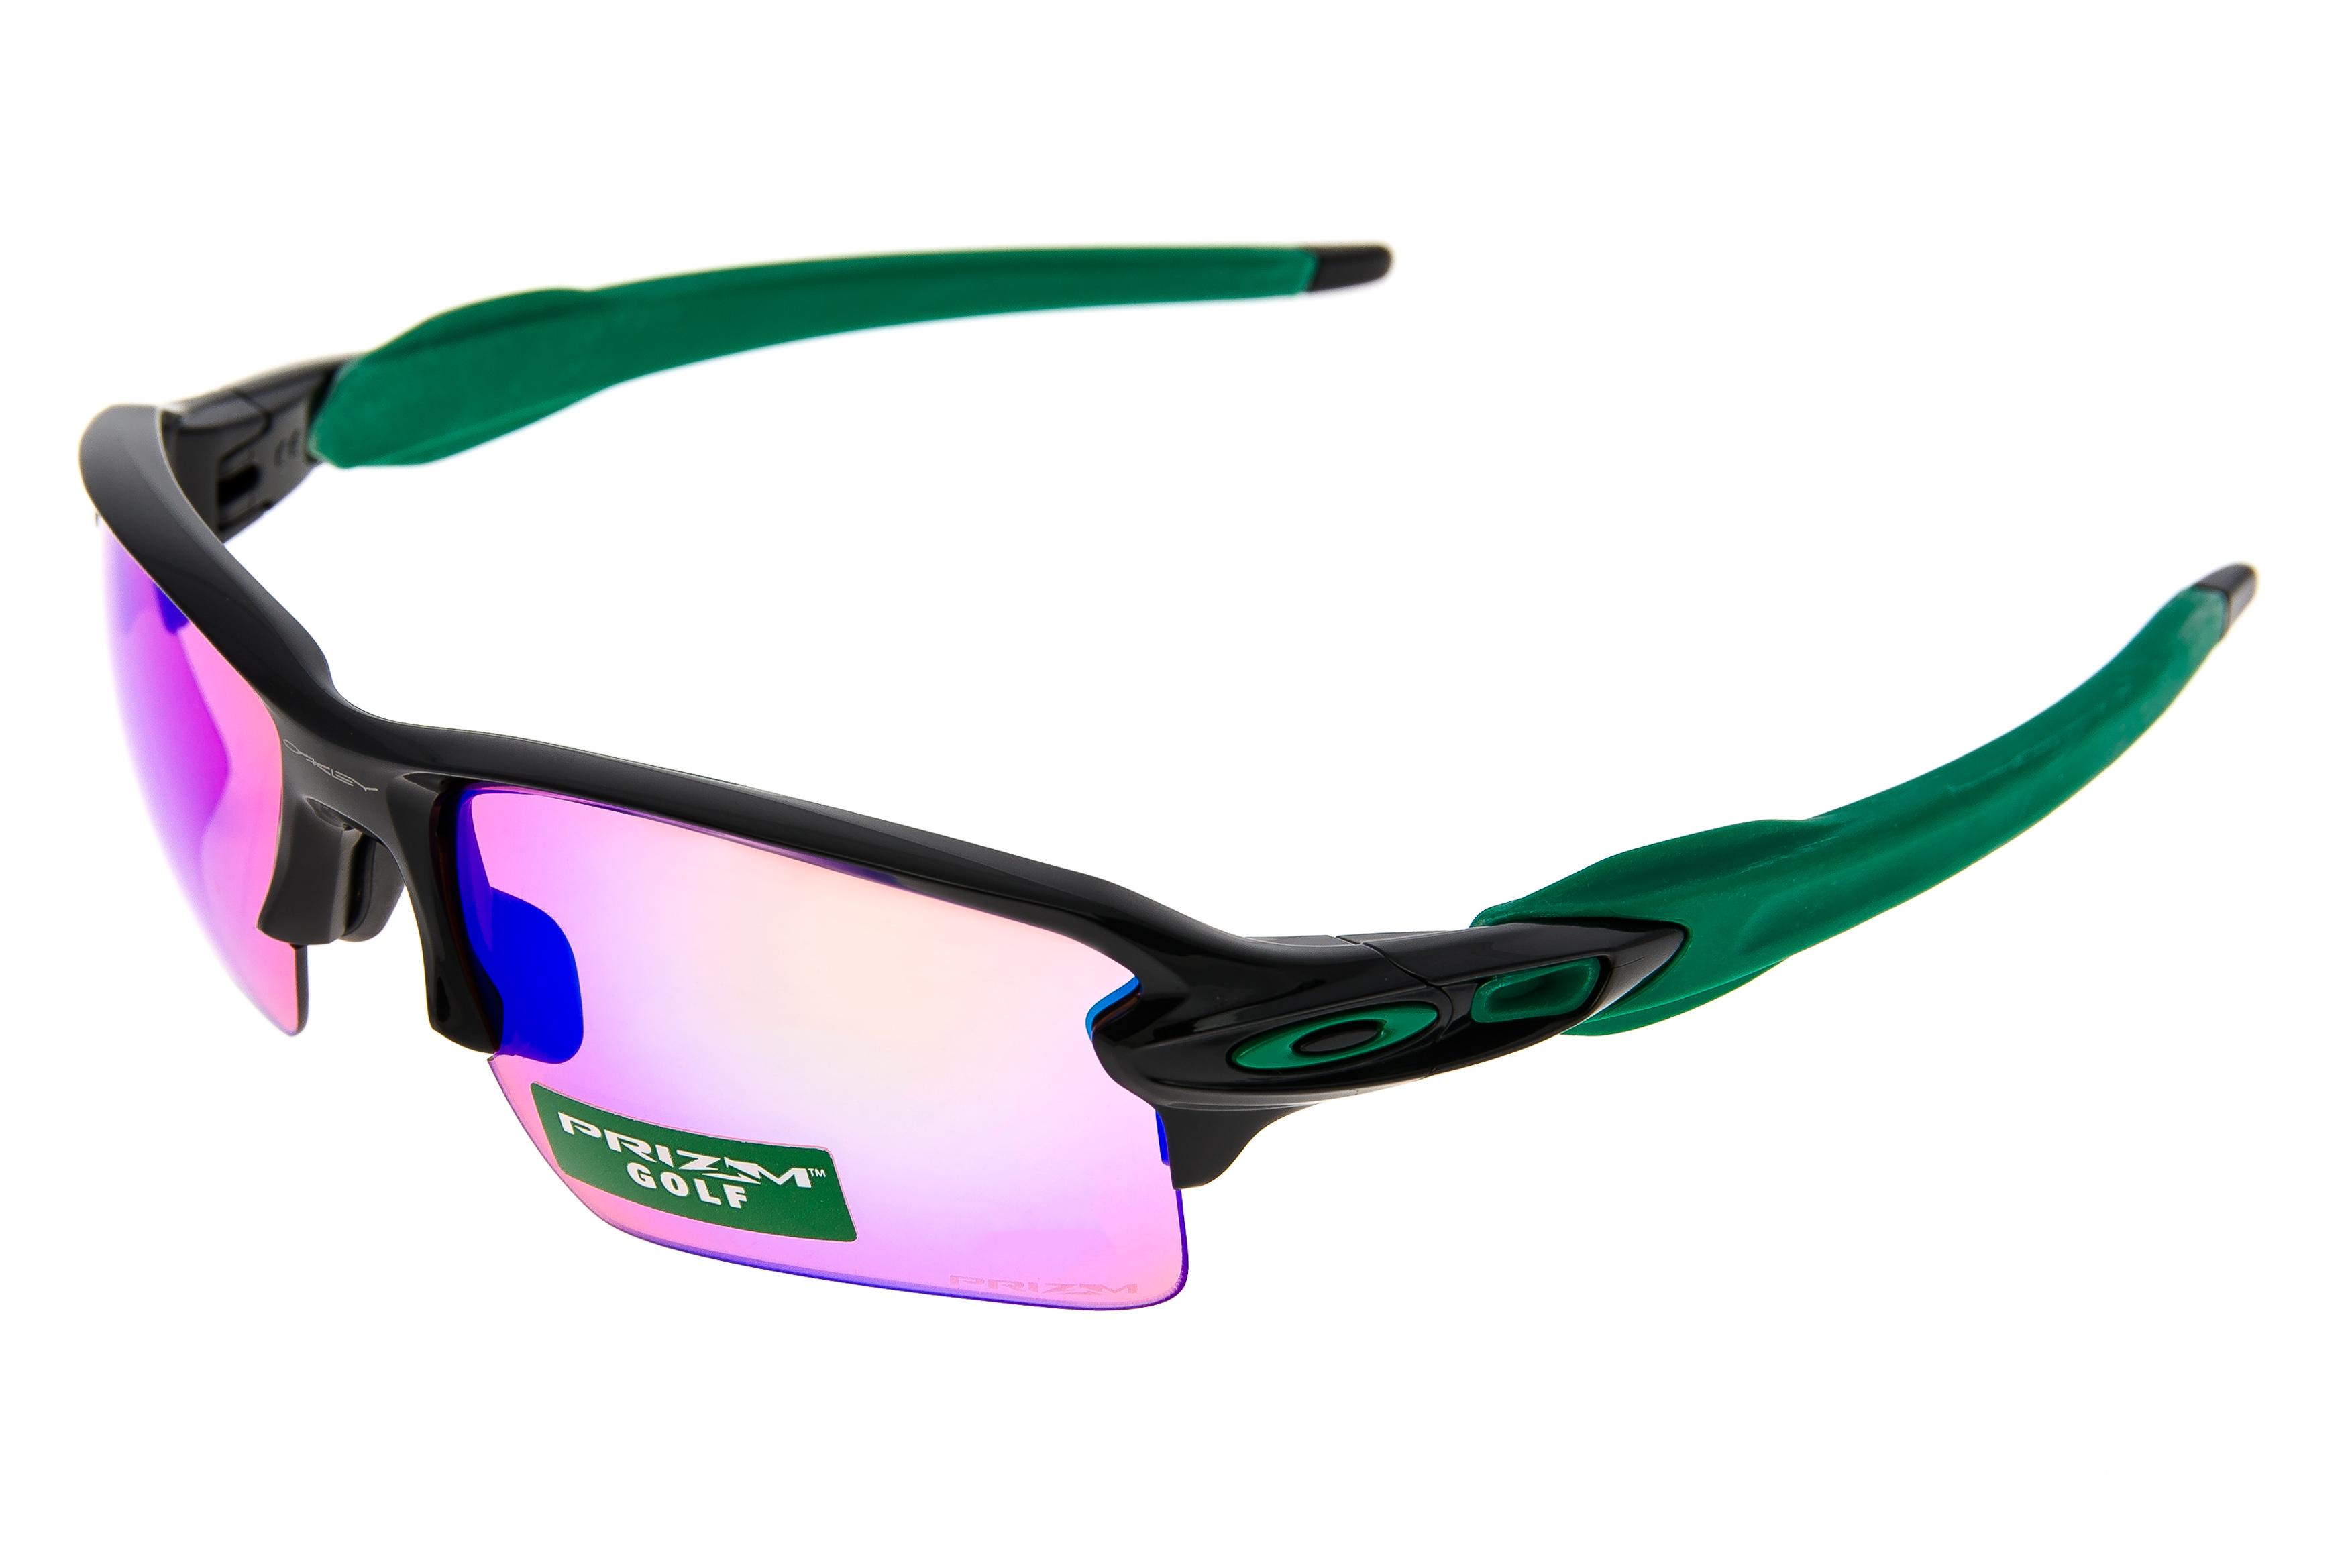 268b6a5bc08 Oakley Flak 2.0 Sunglasses Black Green Frame Prizm Golf Lens